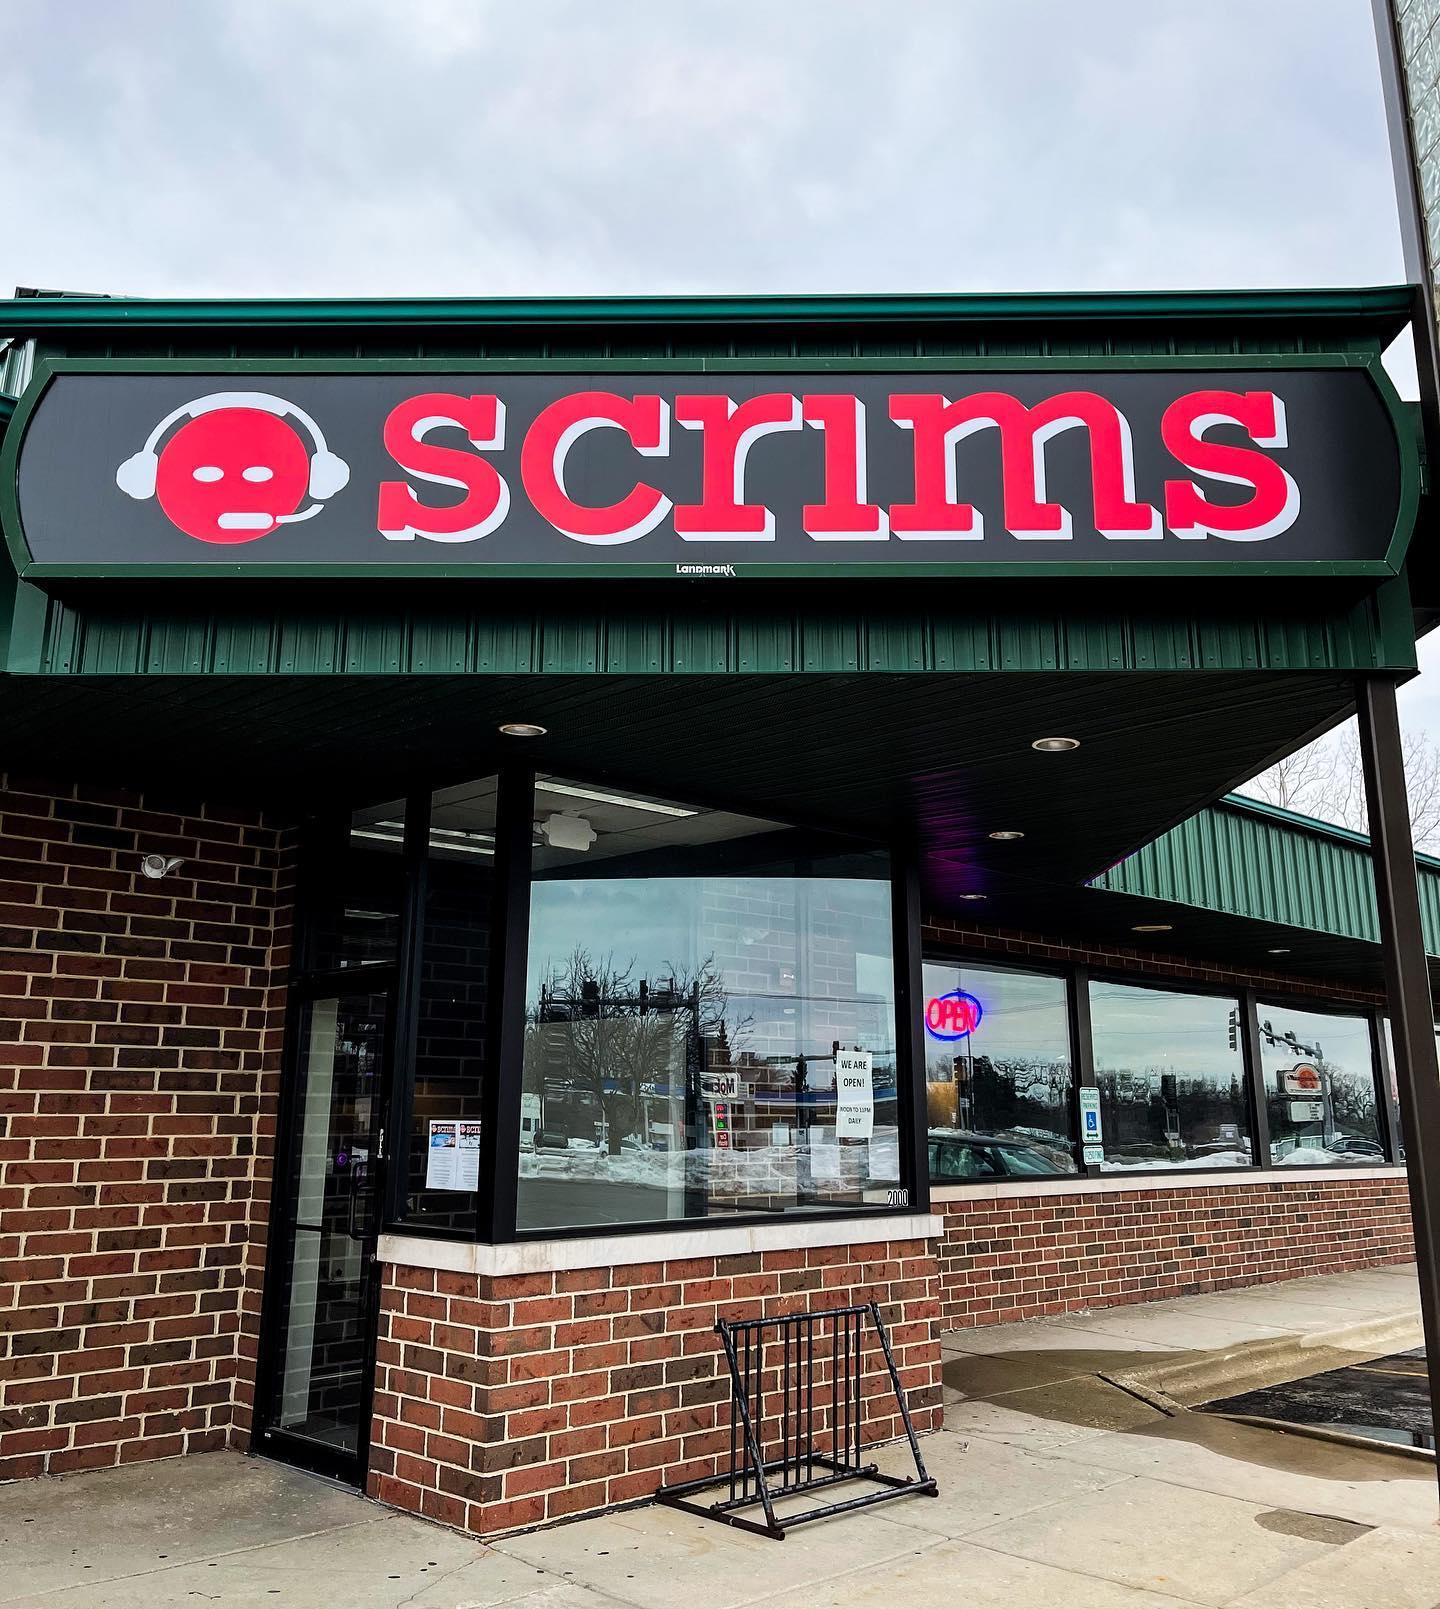 Scrims Esports Gaming Center brings esports in Lisle, IL